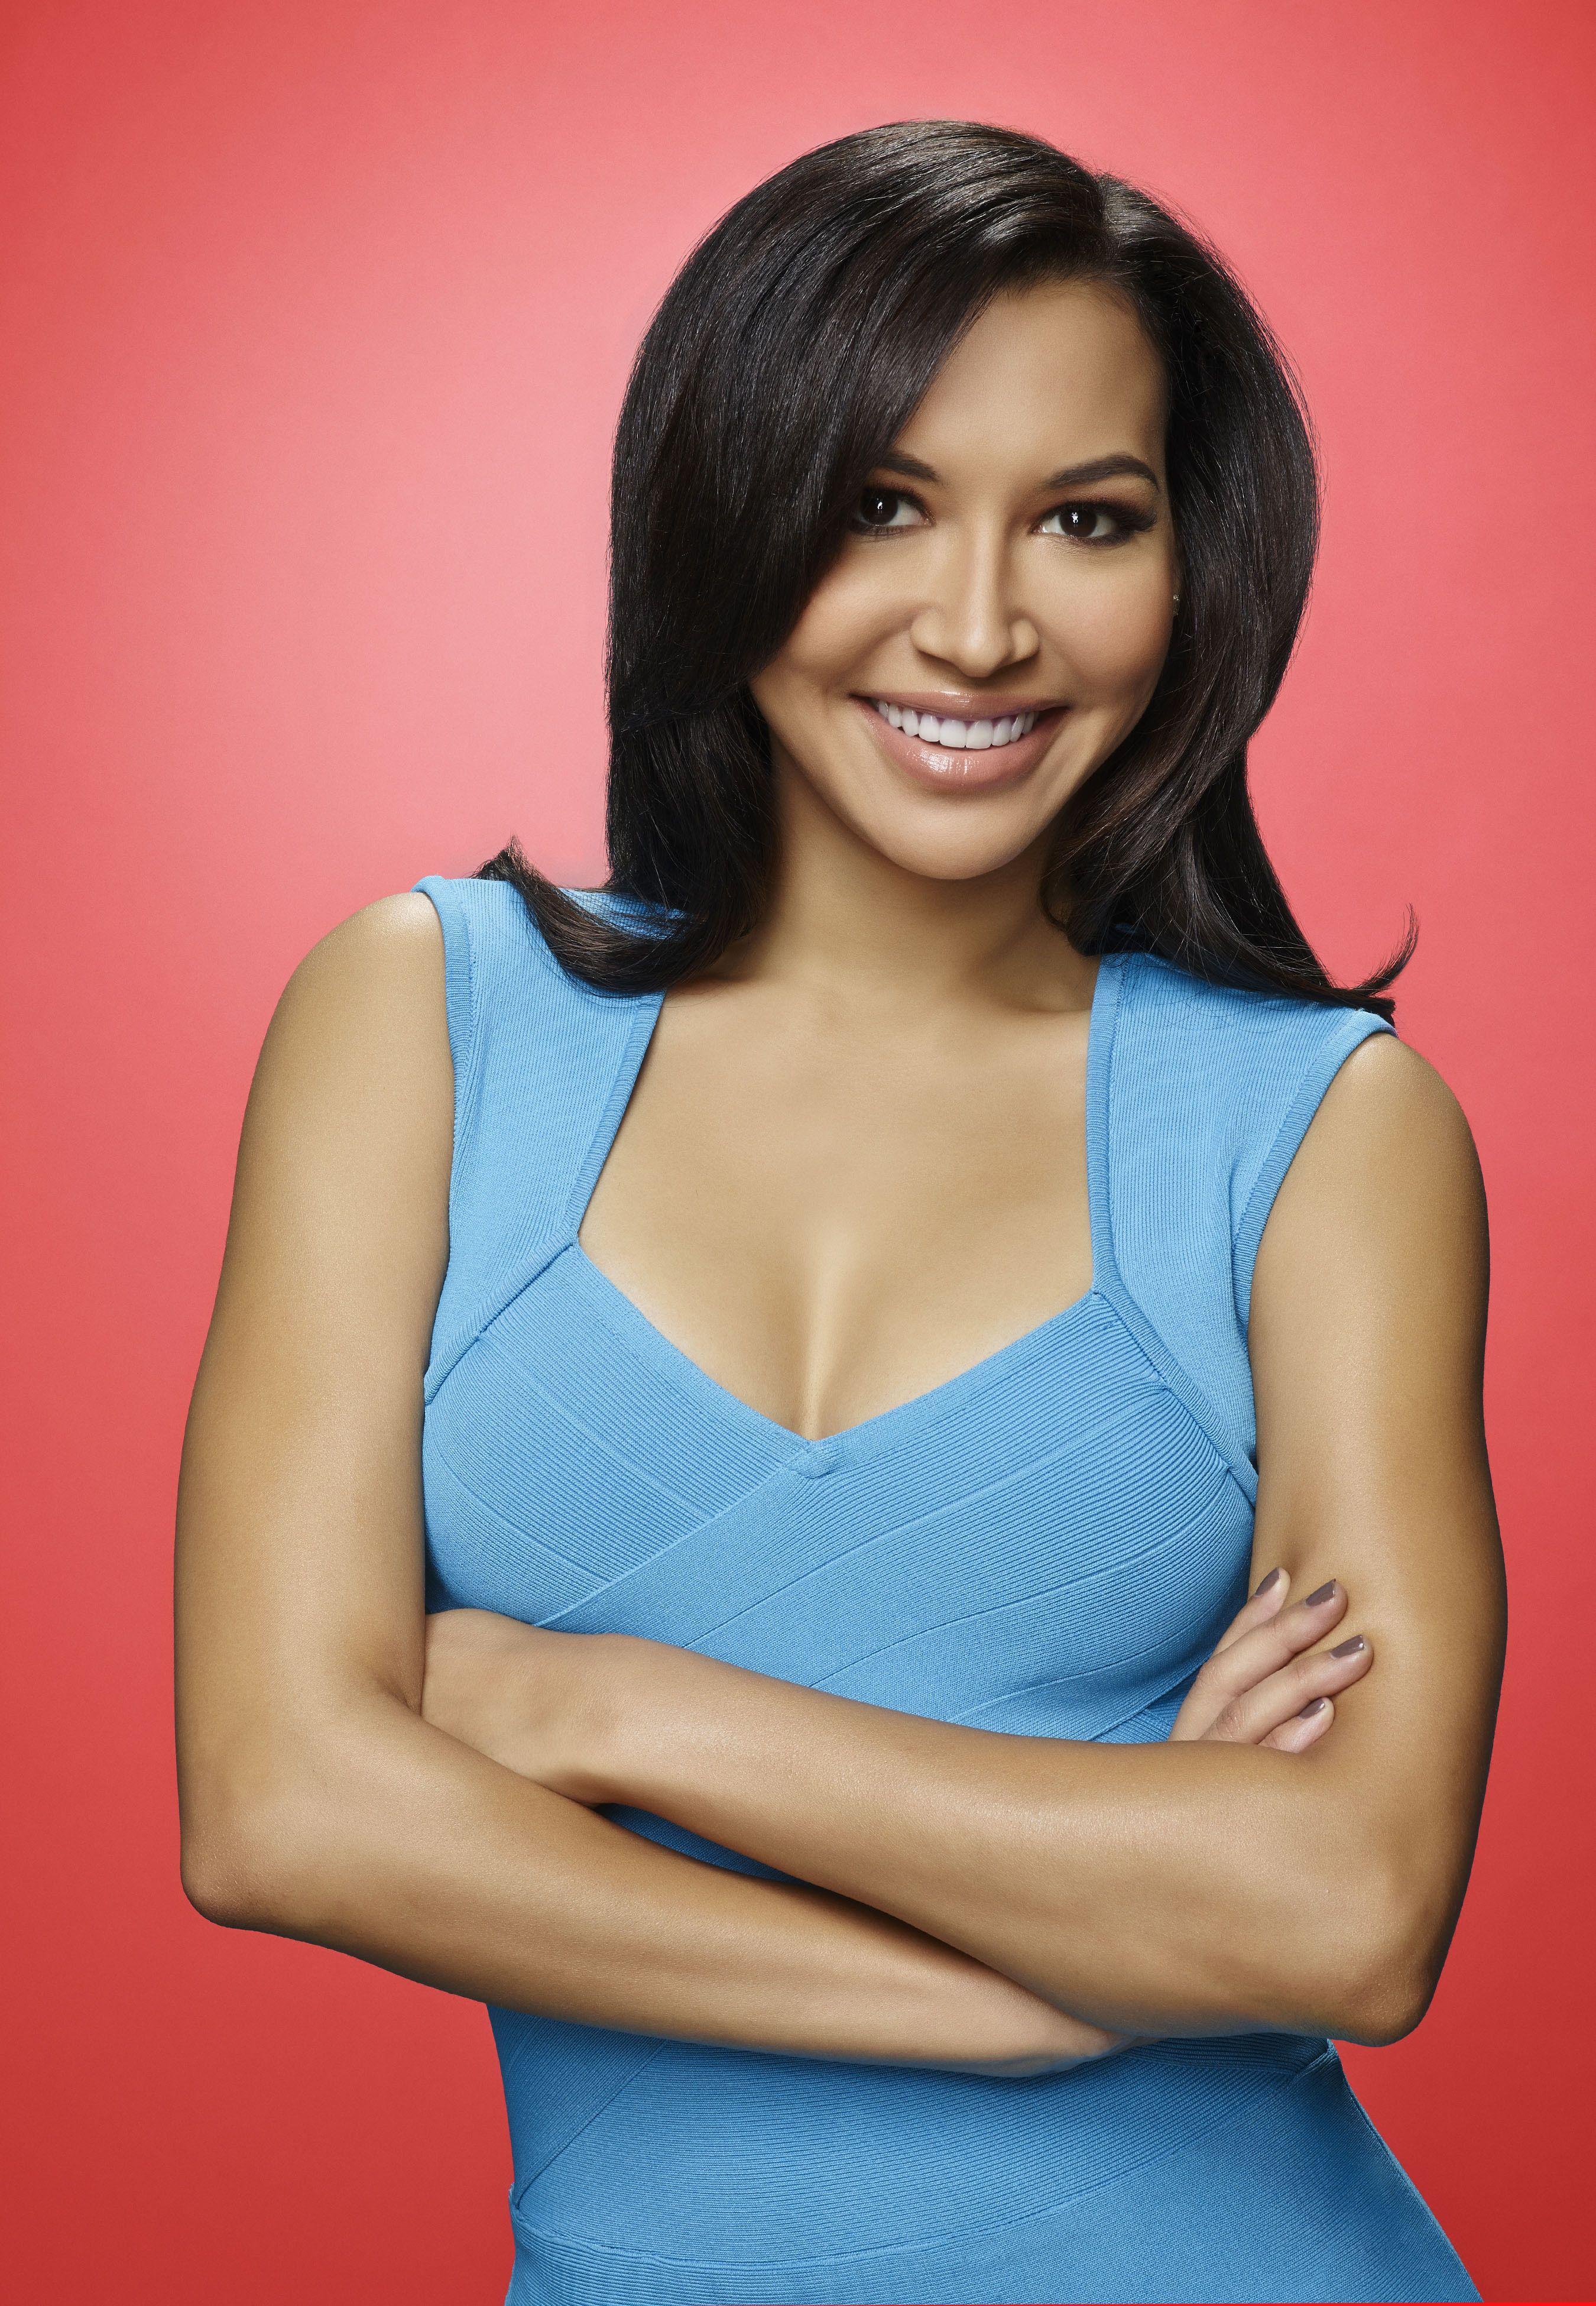 Naya Rivera as Santana Lopez in #Glee - Season 6 (The Final Season) #Set1